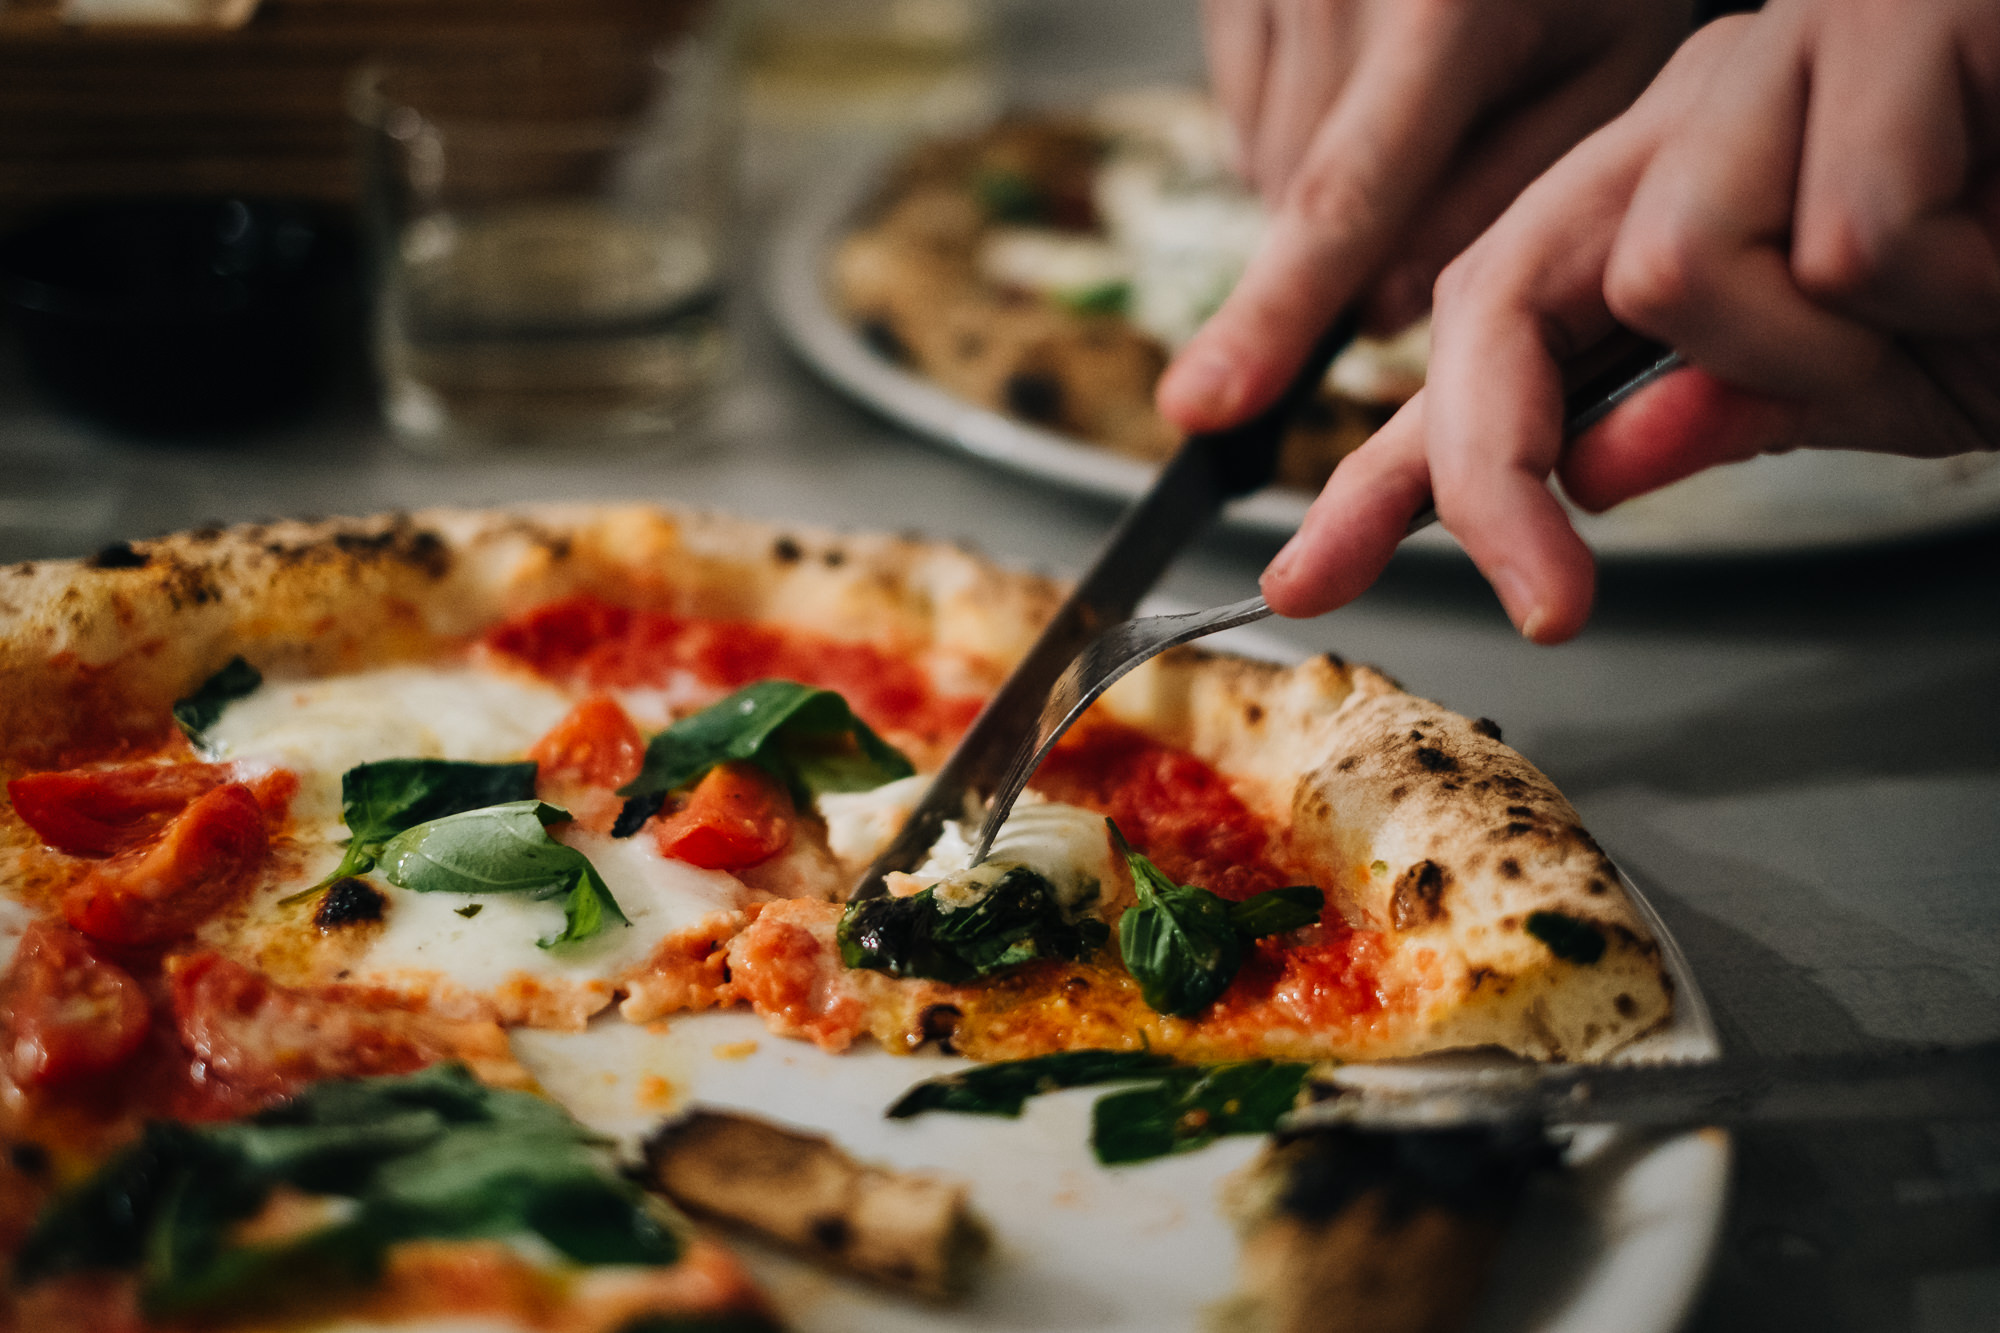 die beste pizza berlins gibt s in neuk lln bei w pizza mit vergn gen berlin. Black Bedroom Furniture Sets. Home Design Ideas